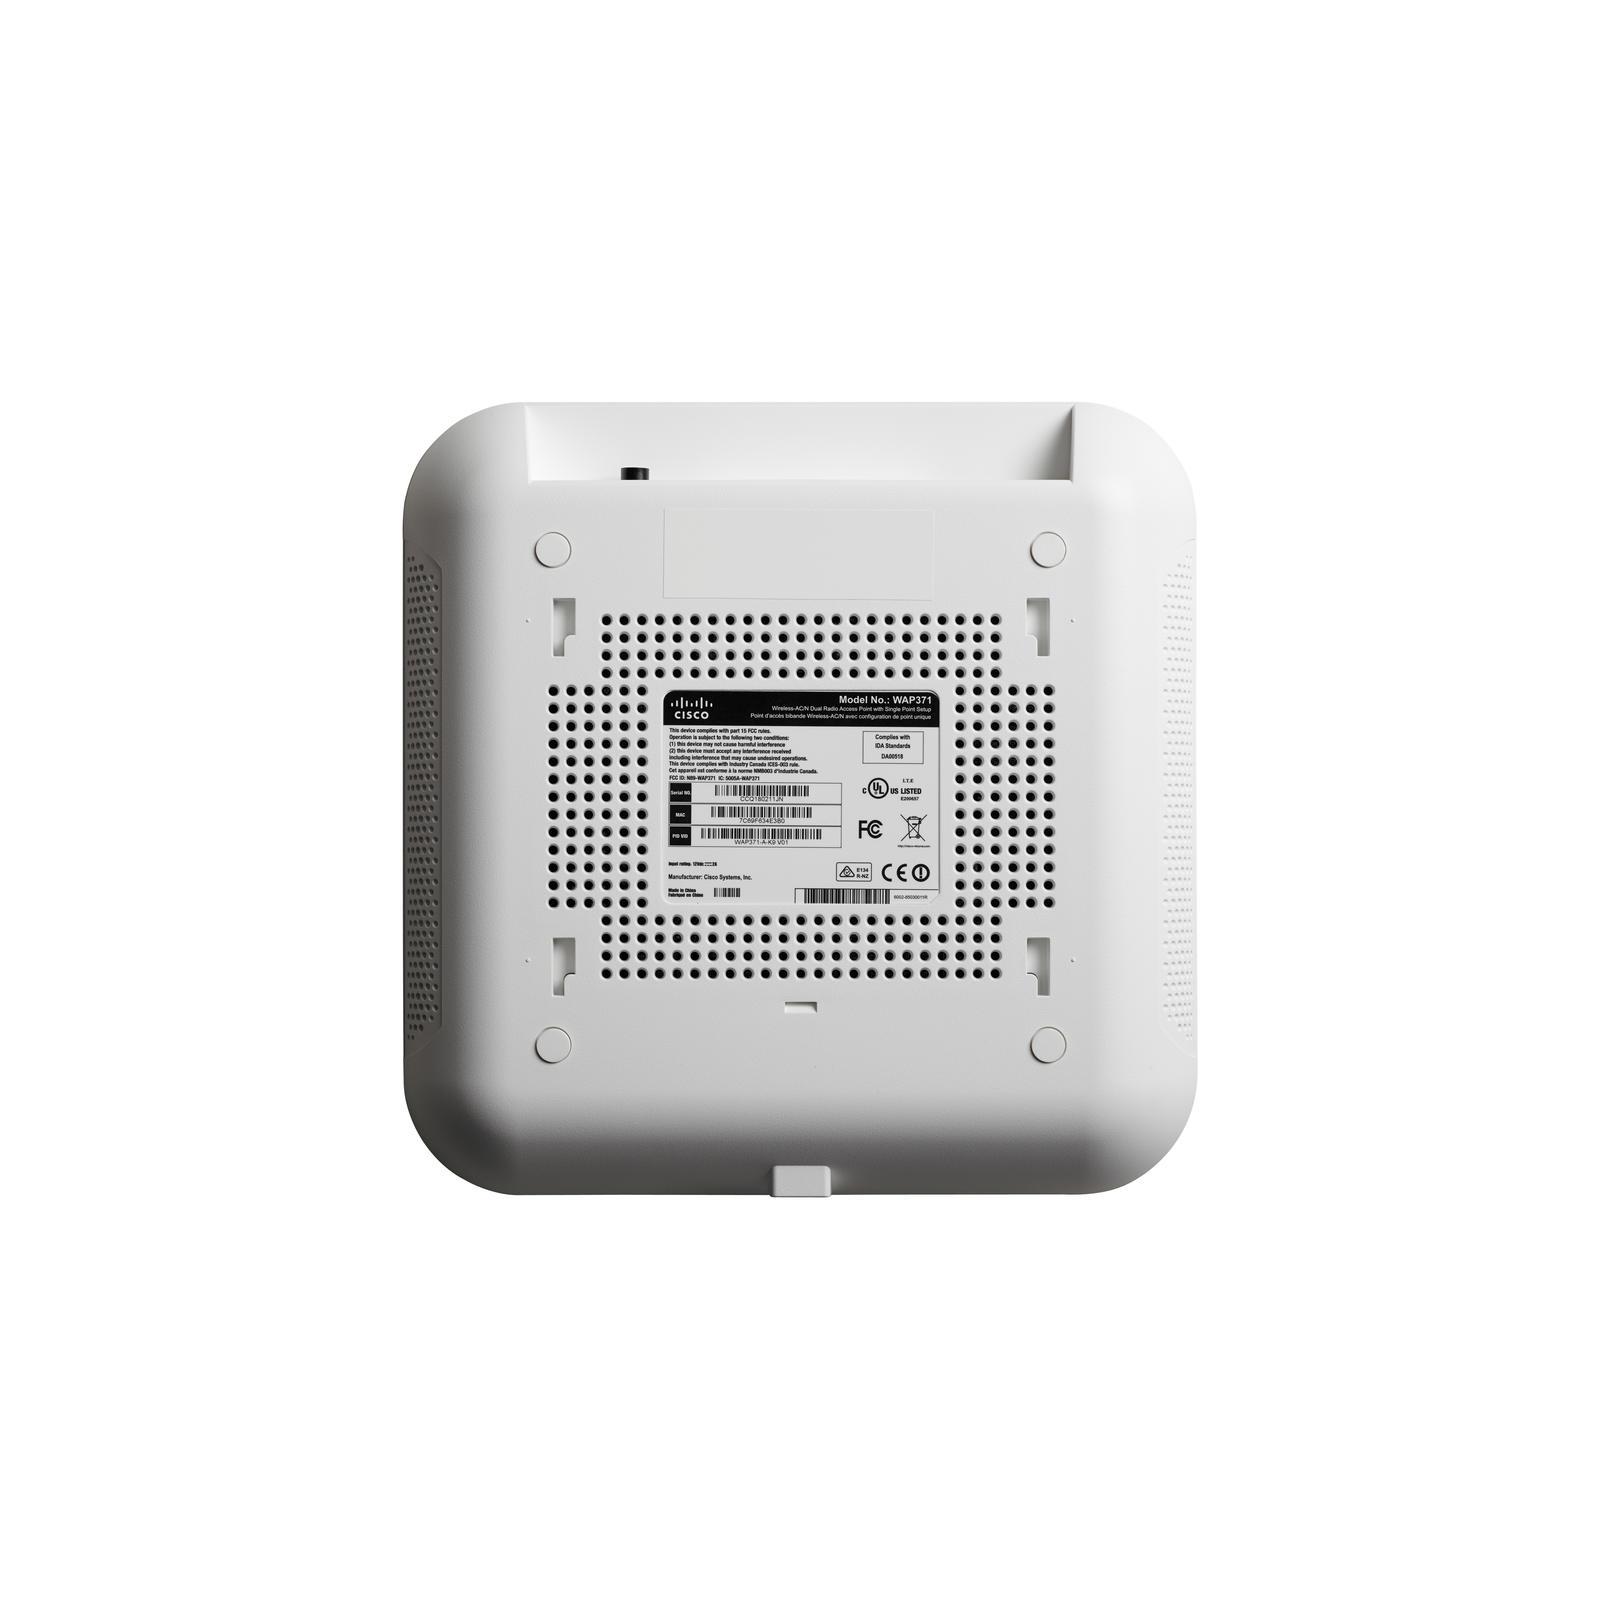 Точка доступа Wi-Fi Cisco WAP371 (WAP371-E-K9) изображение 2